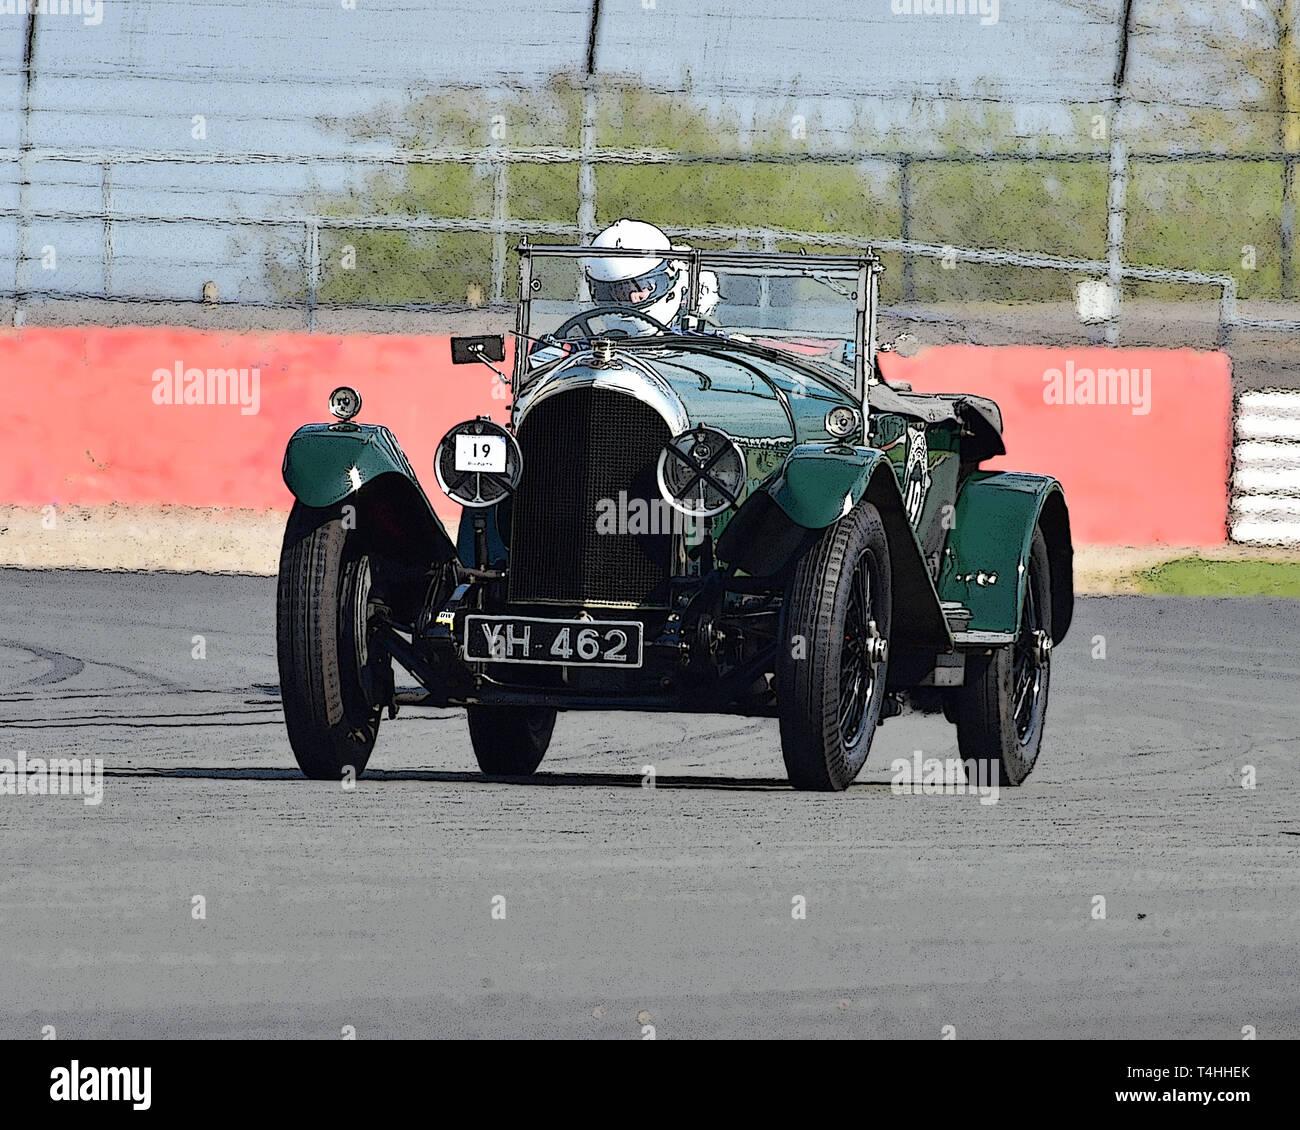 Brian Rivett, Bentley 3 litre Speed Model, Benjafield 100, 100 Years of Bentley, April 2019,  Silverstone, Northamptonshire, England, circuit racing,  - Stock Image